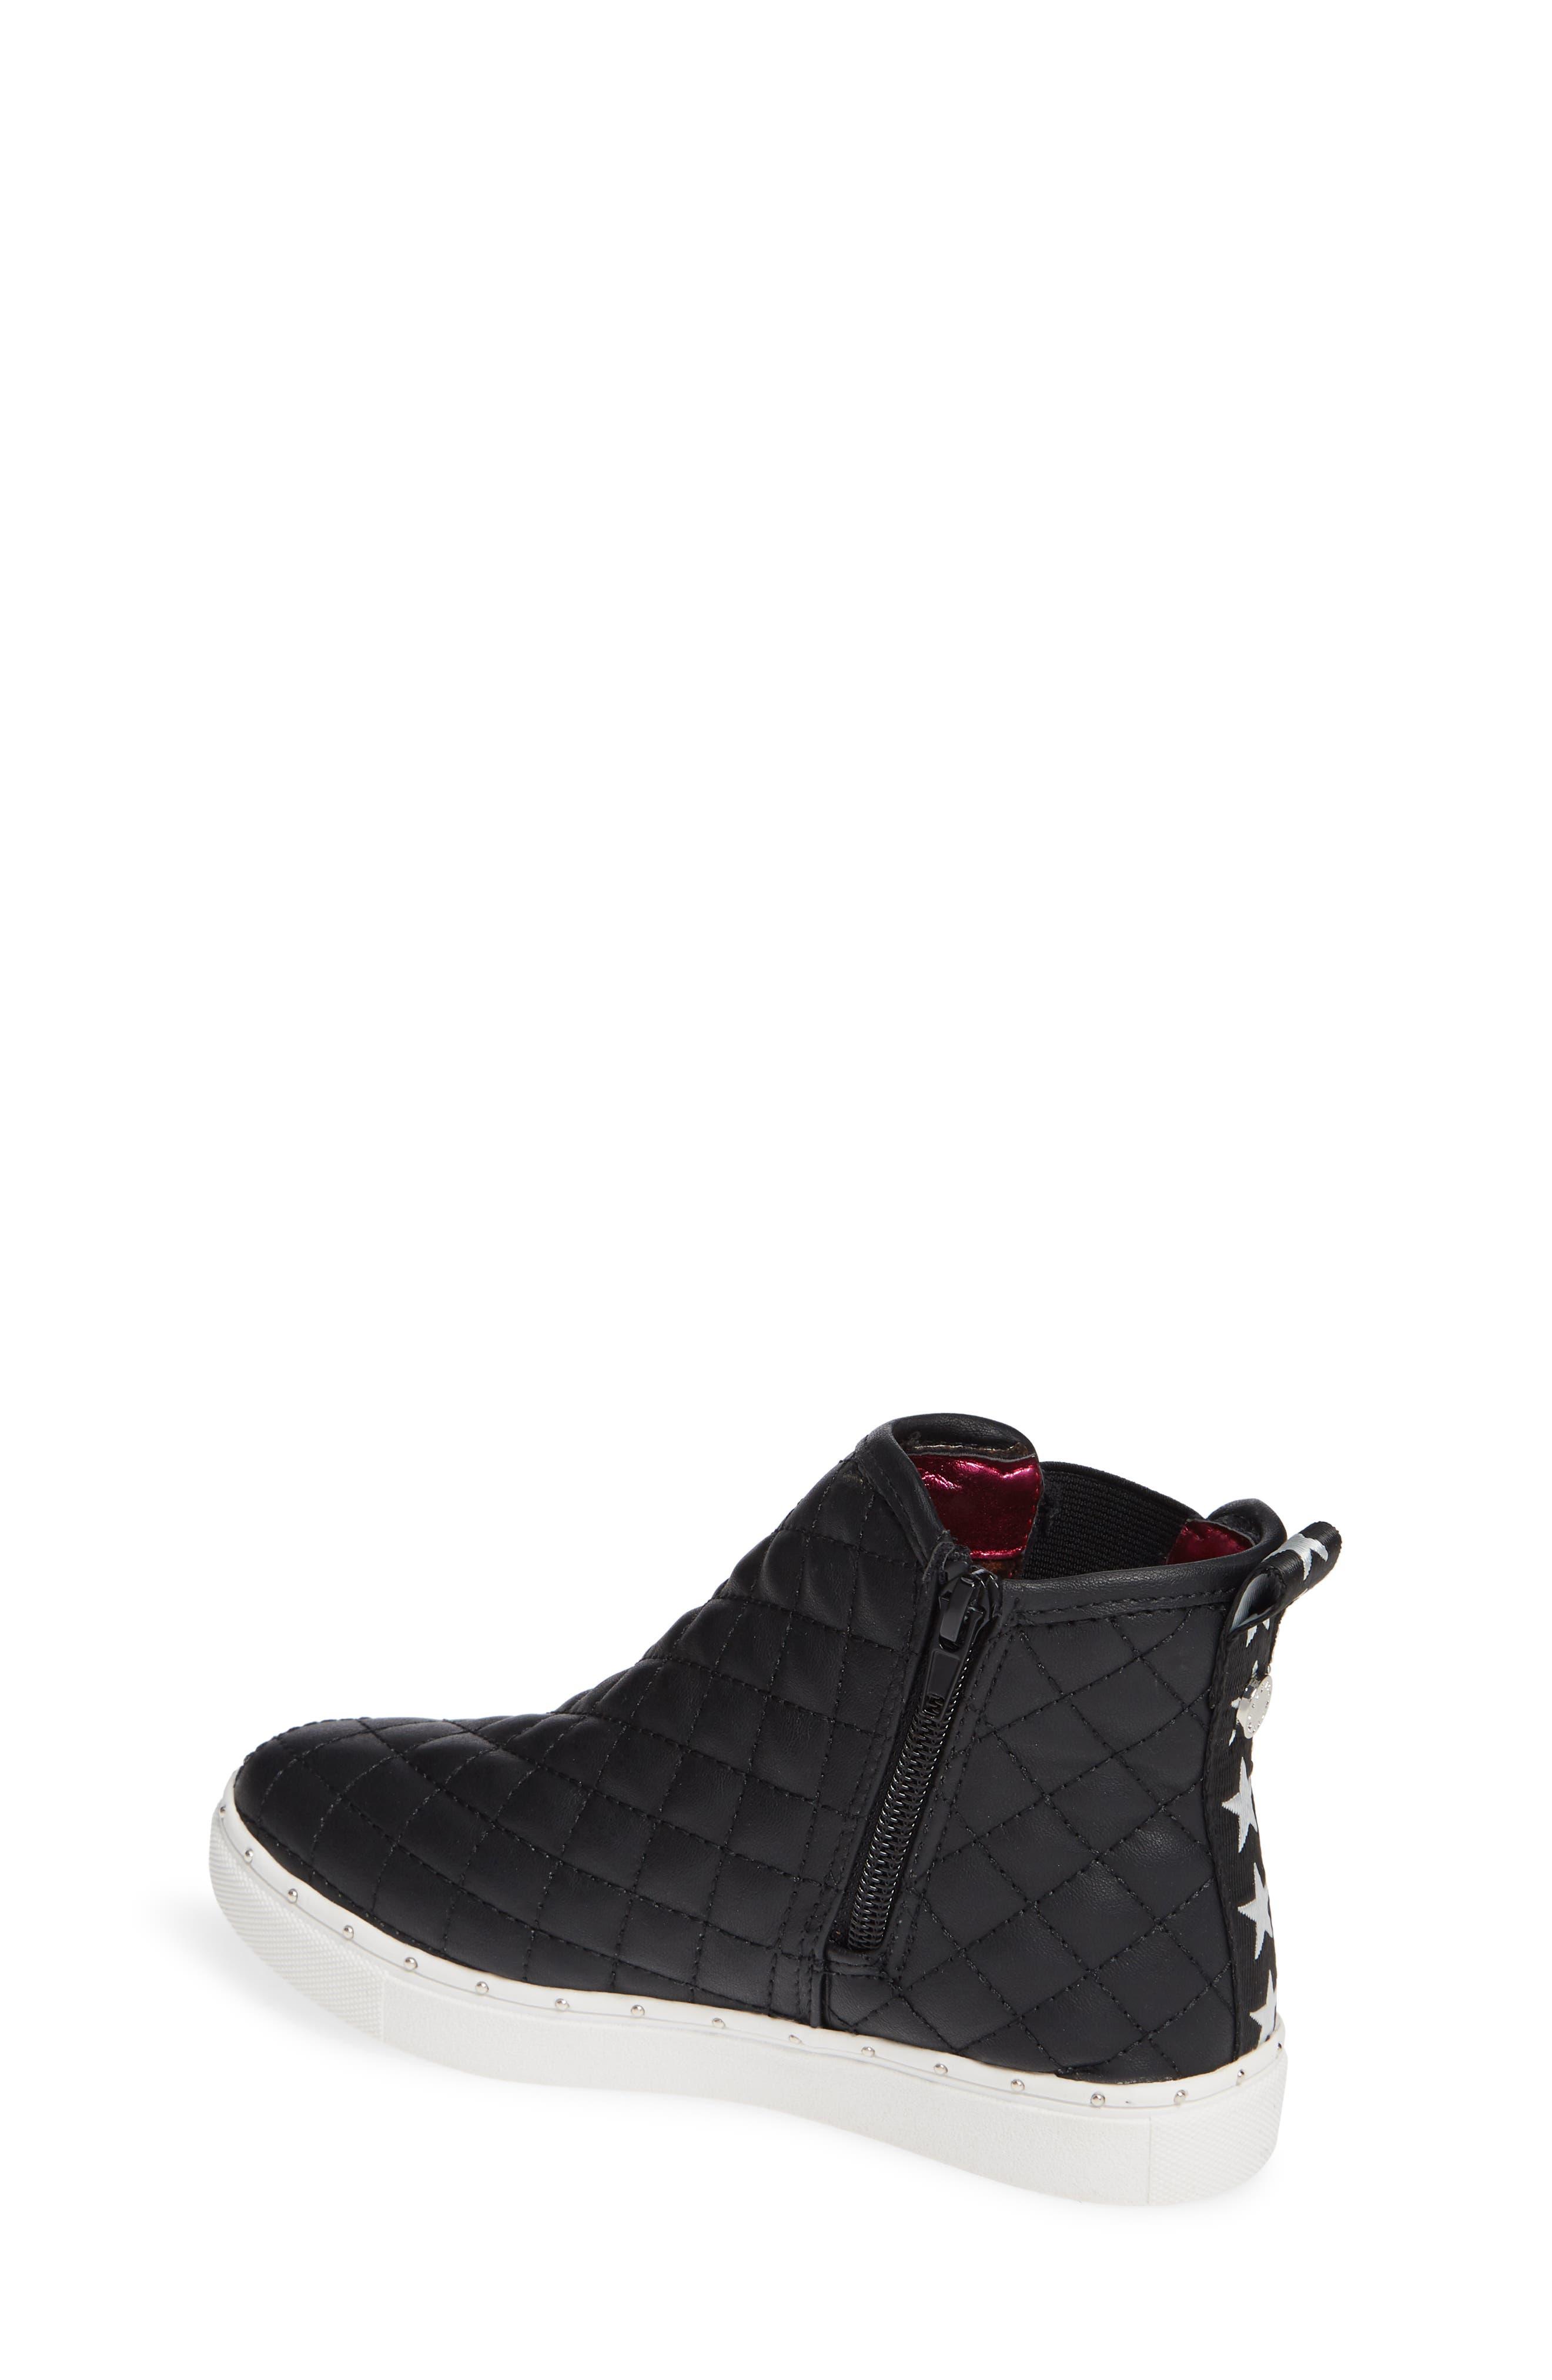 JQuest High Top Platform Sneaker,                             Alternate thumbnail 2, color,                             BLACK